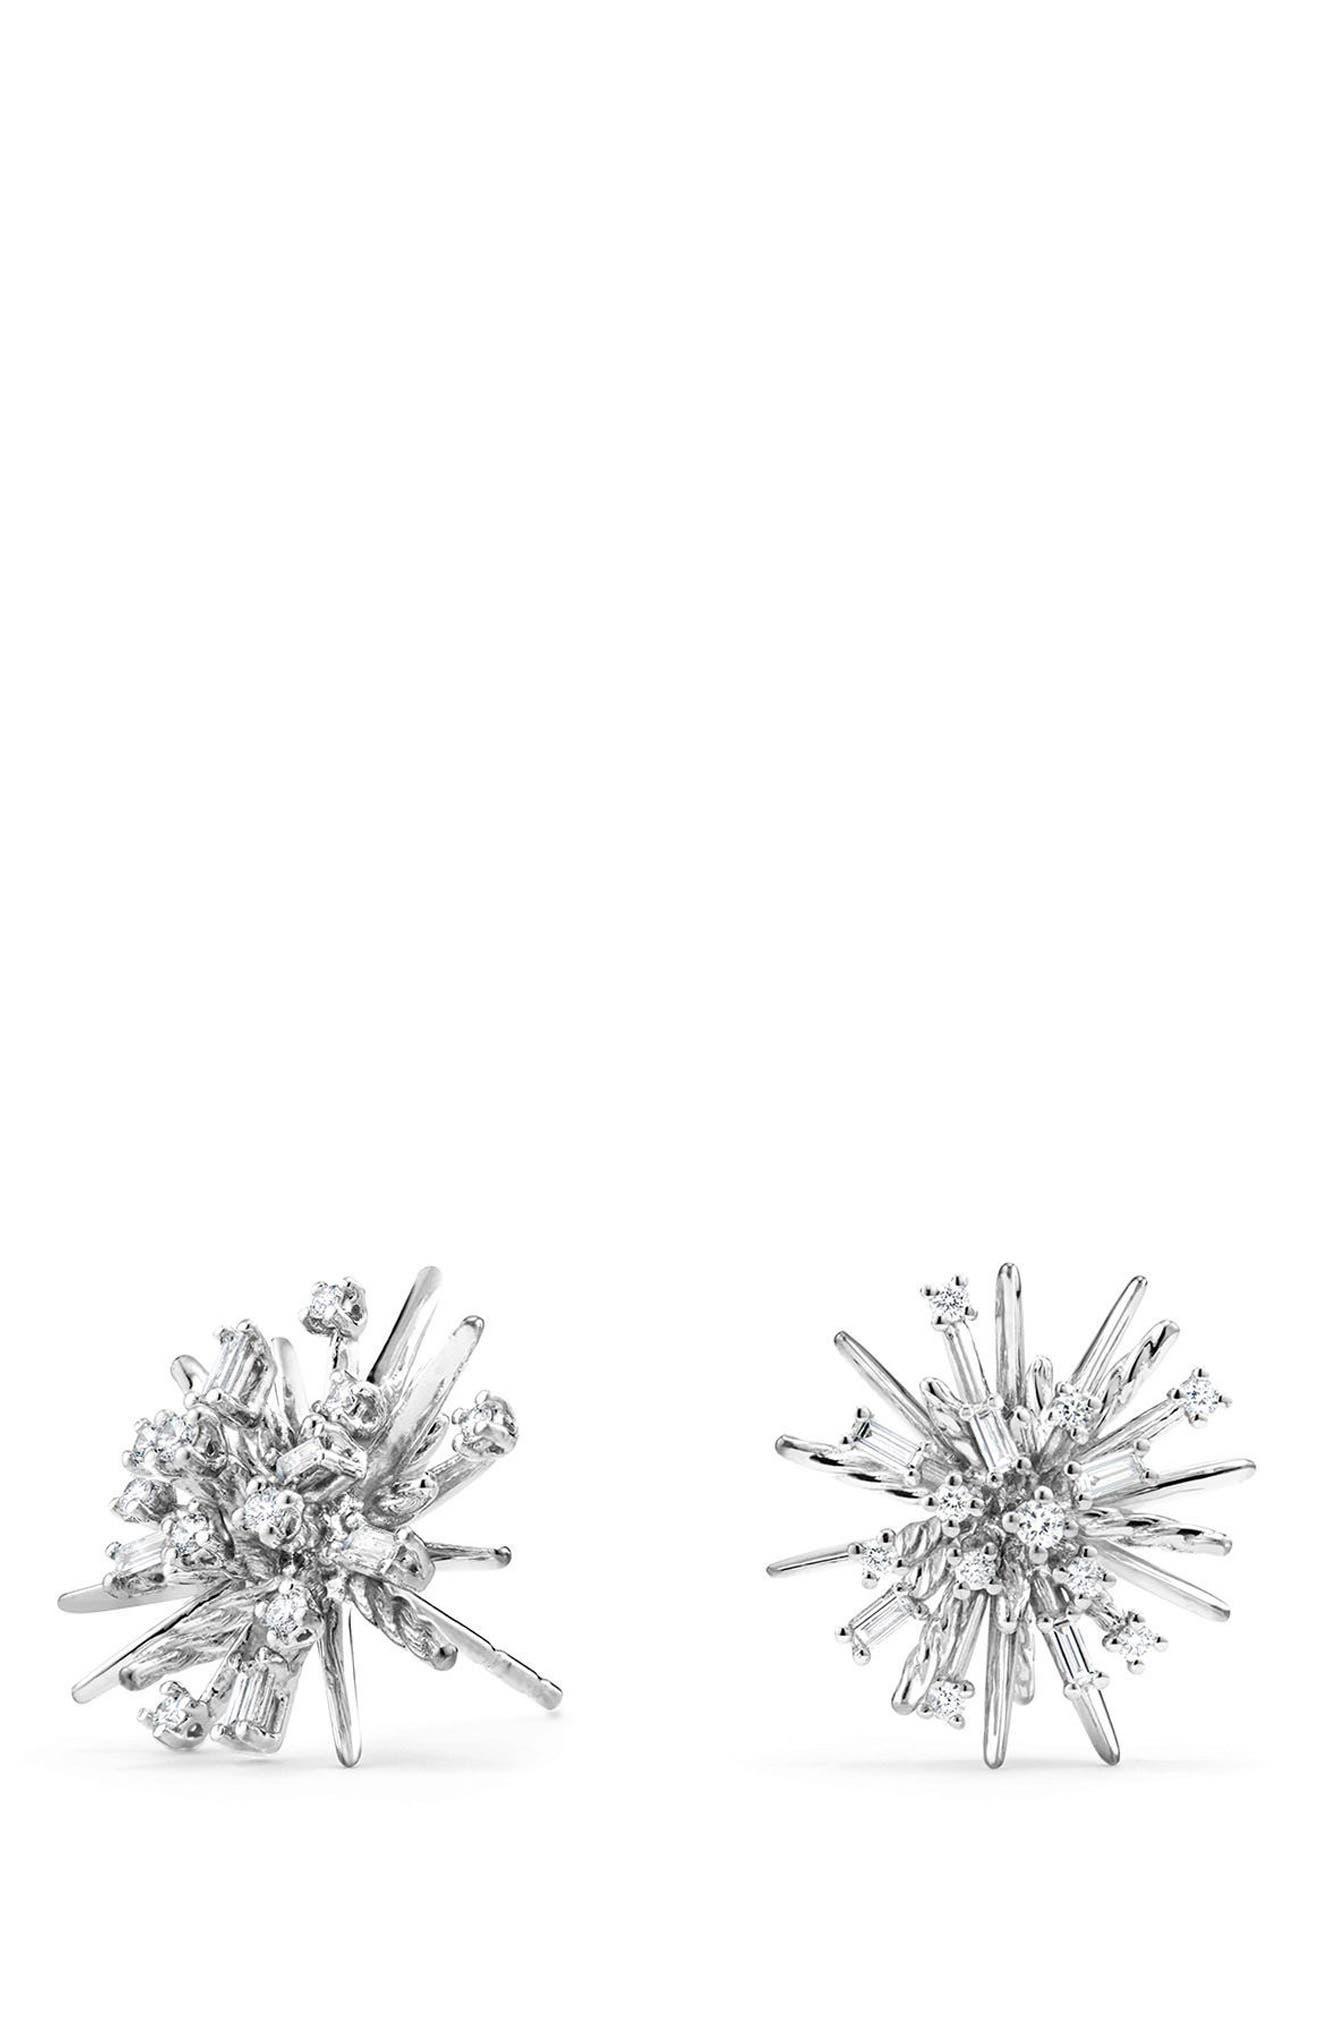 David Yurman Supernova Stud Earrings with Diamonds in 18K White Gold